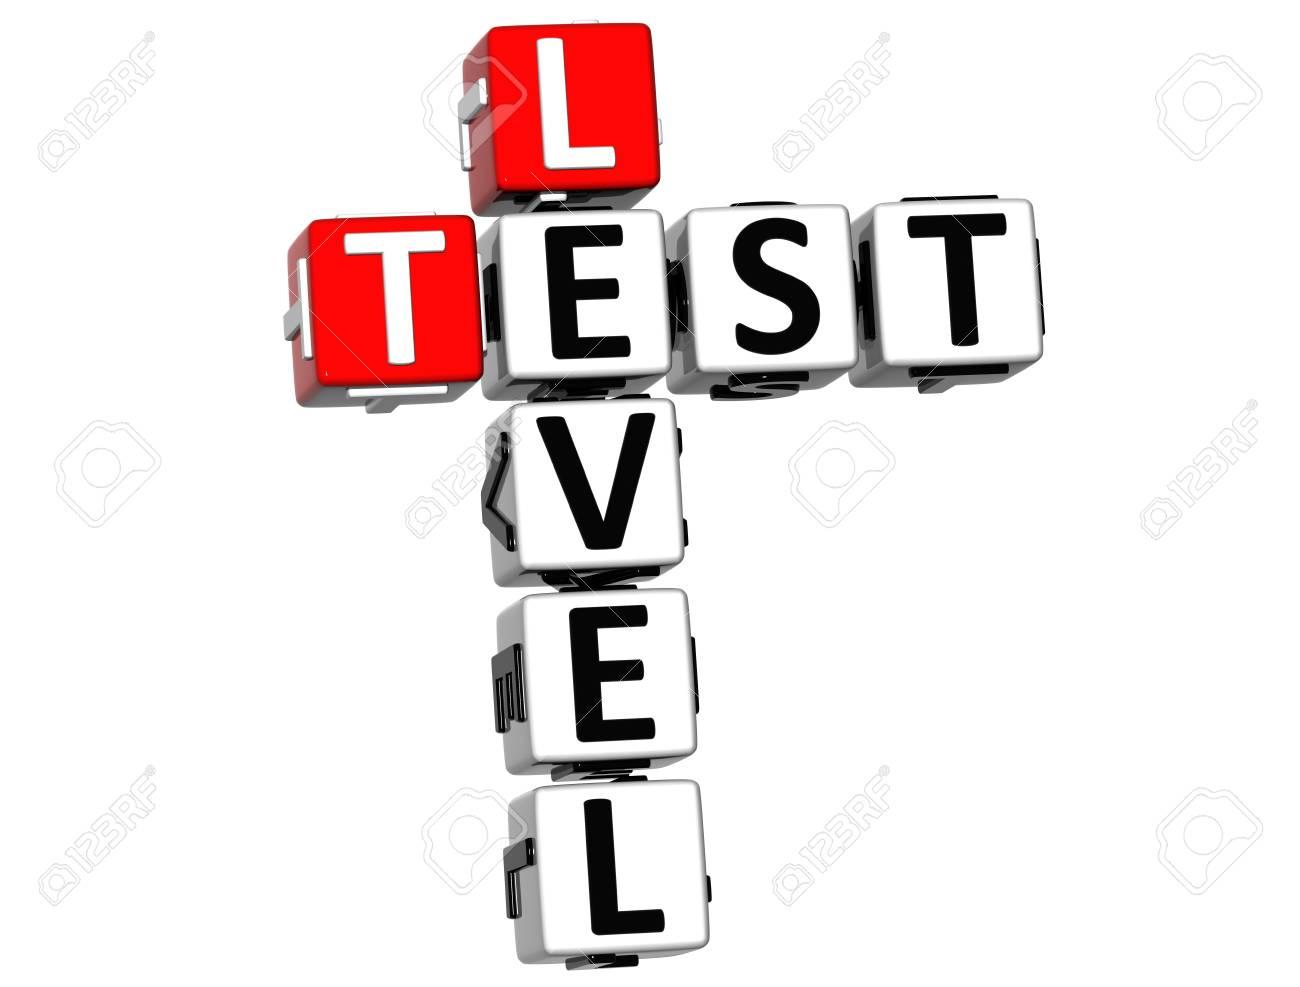 3D Test Level Crossword on white background Stock Photo - 14378238